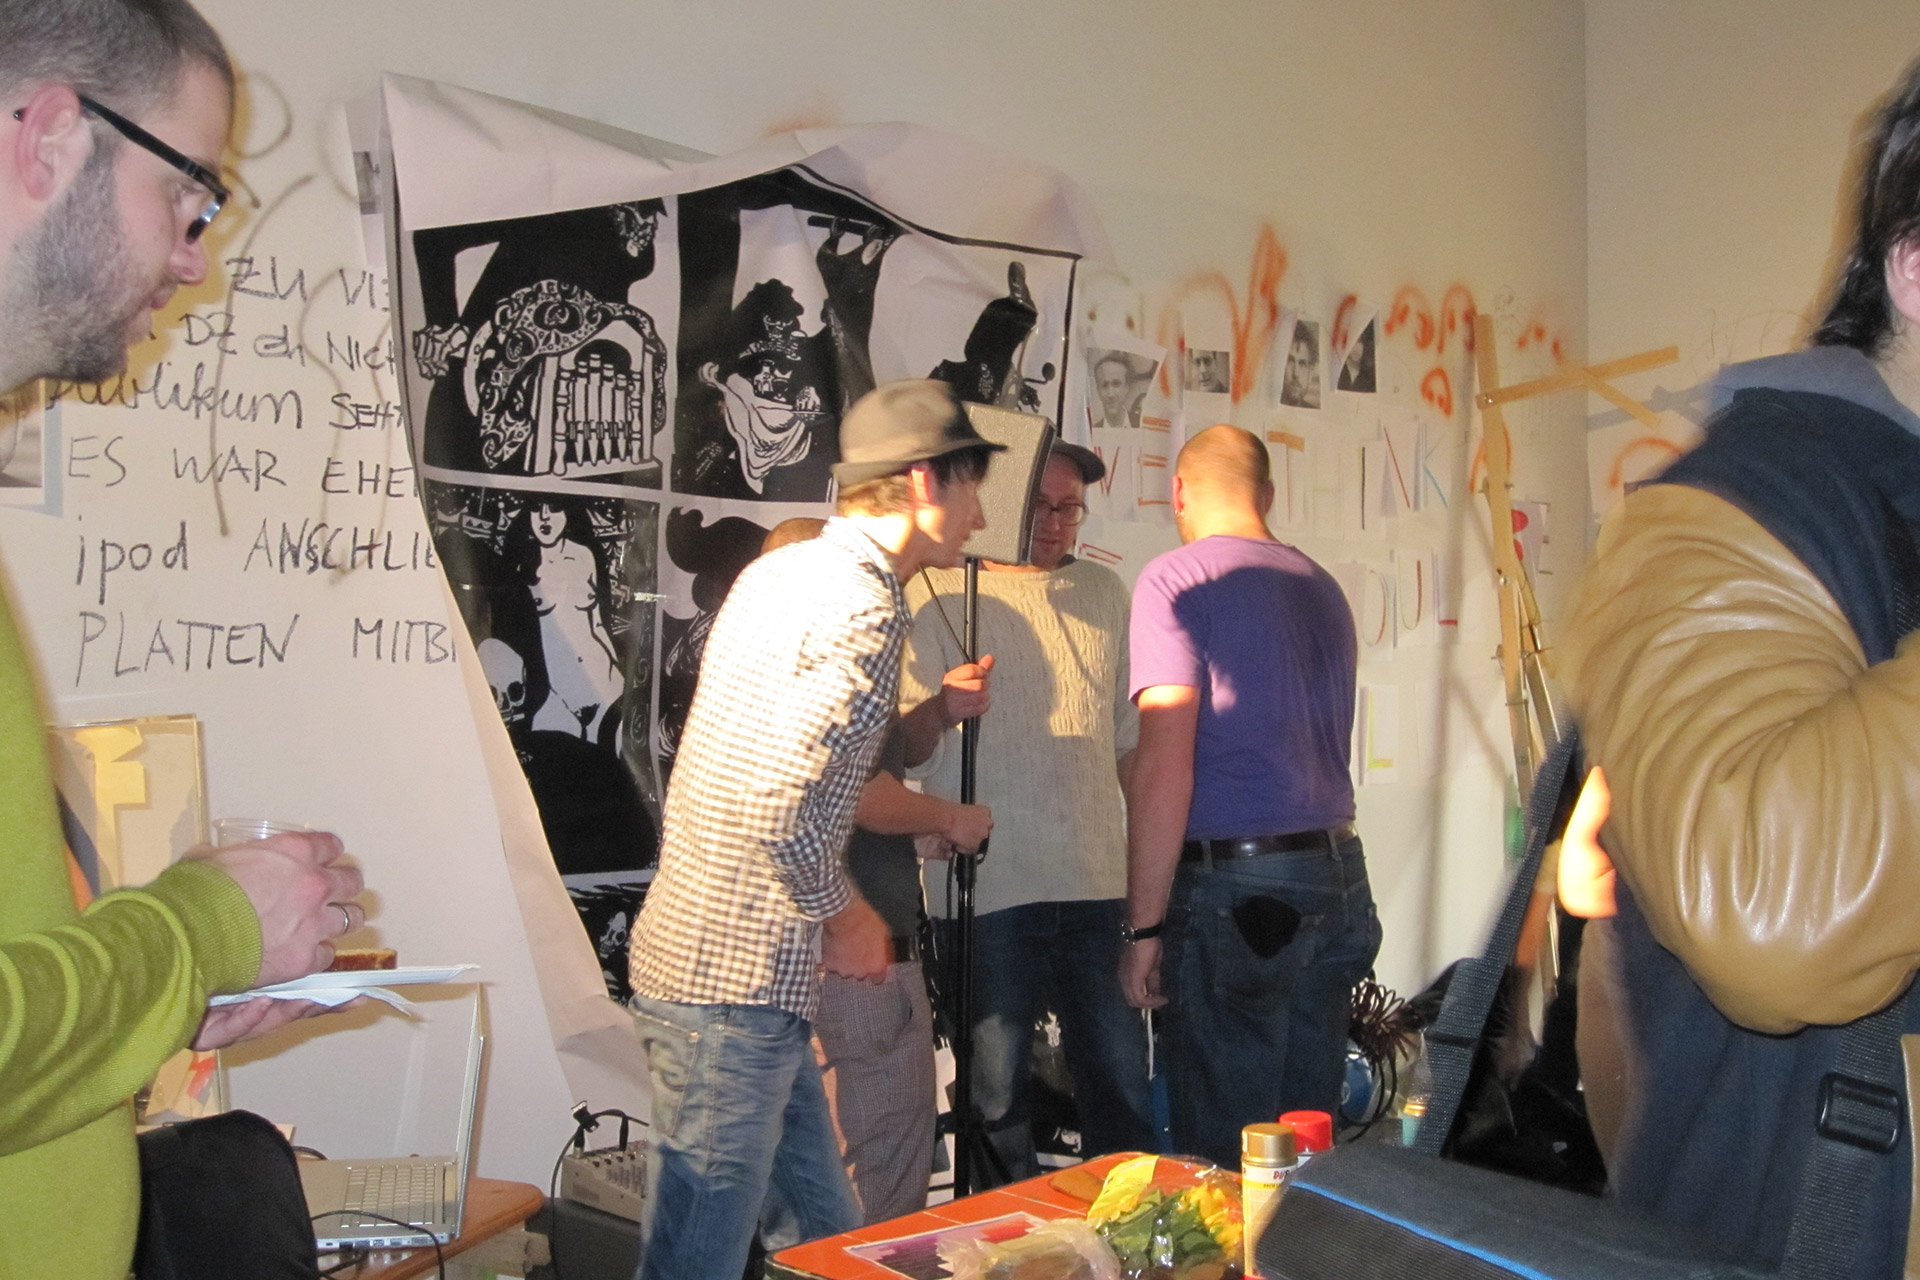 Dezember-Ausstellung-Kunsthalle-Winterthur-2011-3.jpg